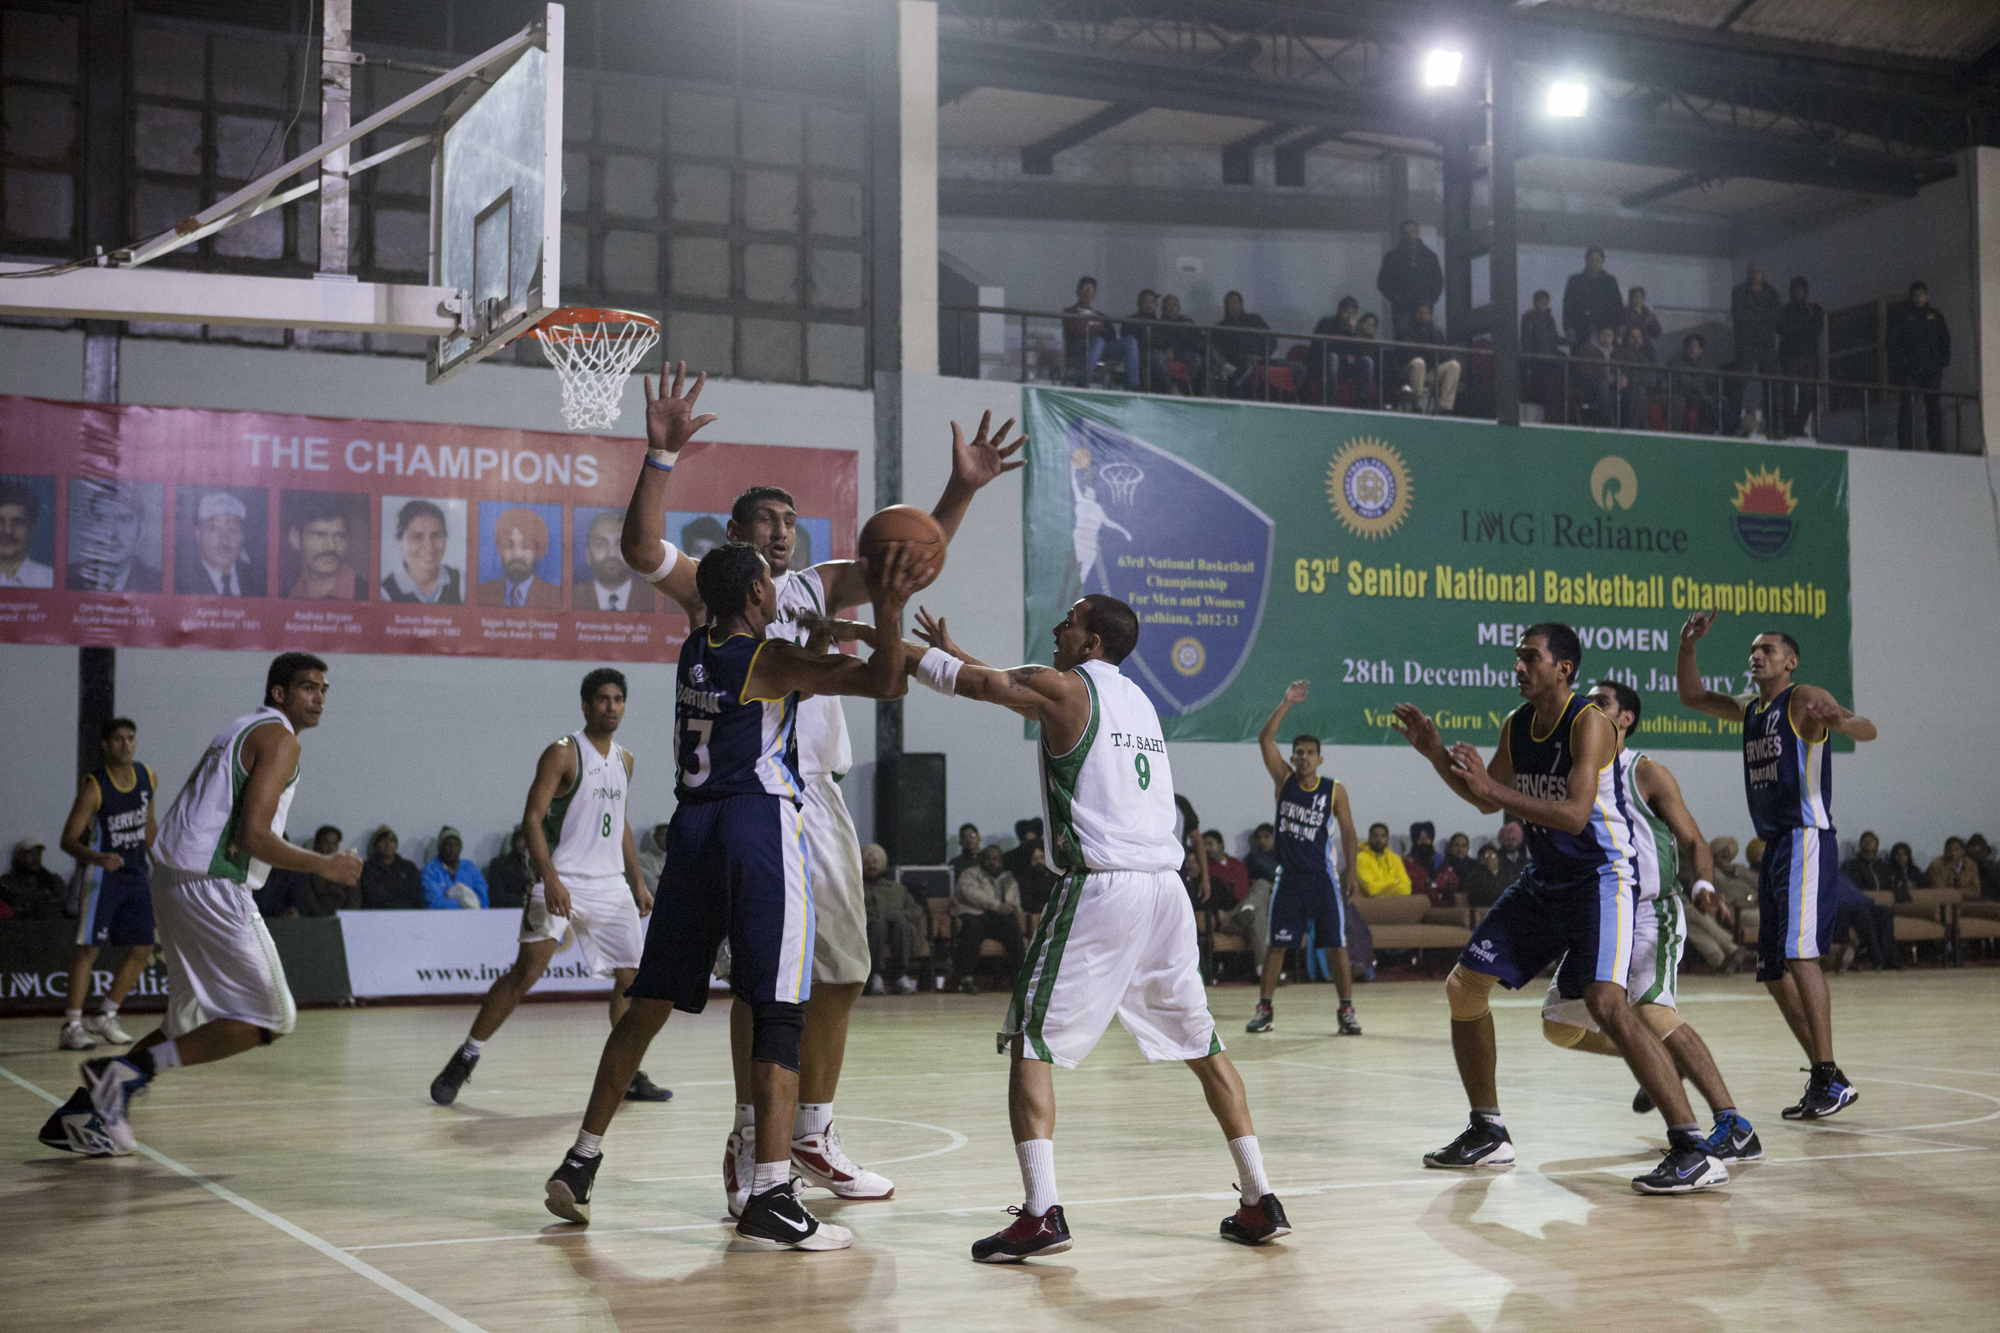 Satnam Singh defending the basket, Punjab team vs Services, 63rd Senior National Basketball Championship, Ludhiana, 2012.